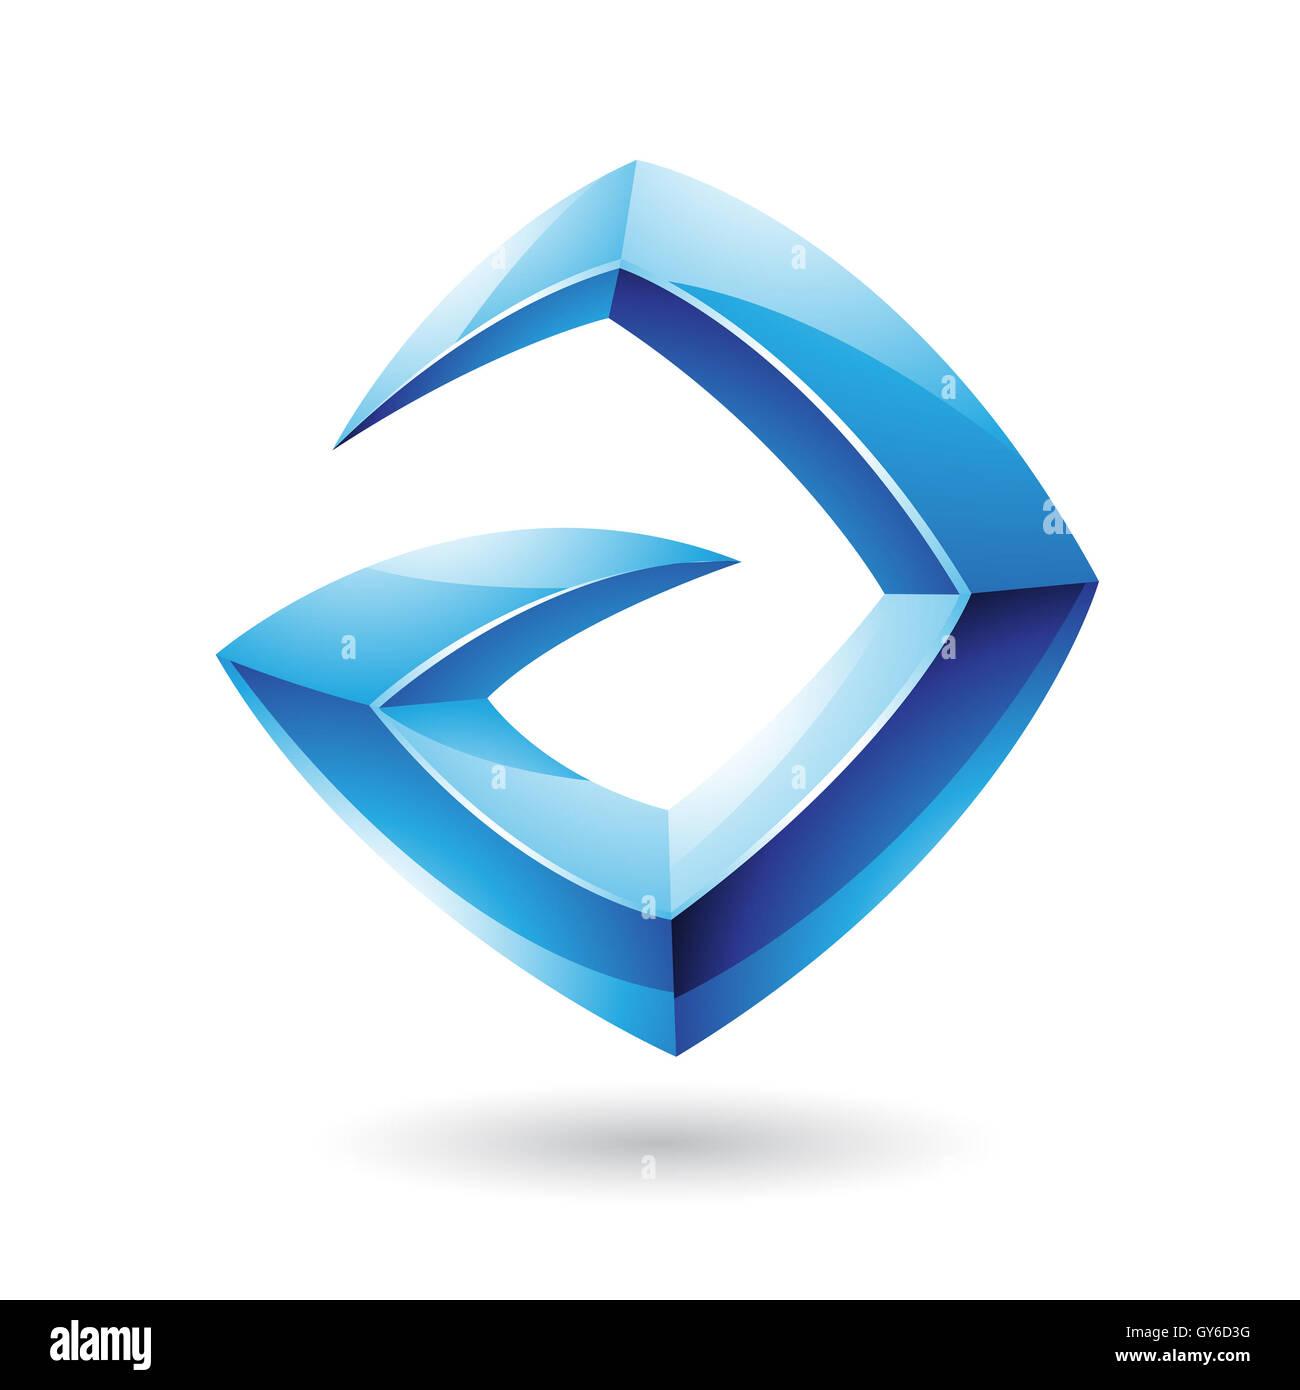 Vector Illustration of a 3d Sharp Glossy Blue Logo Shape based on Letter A - Stock Image